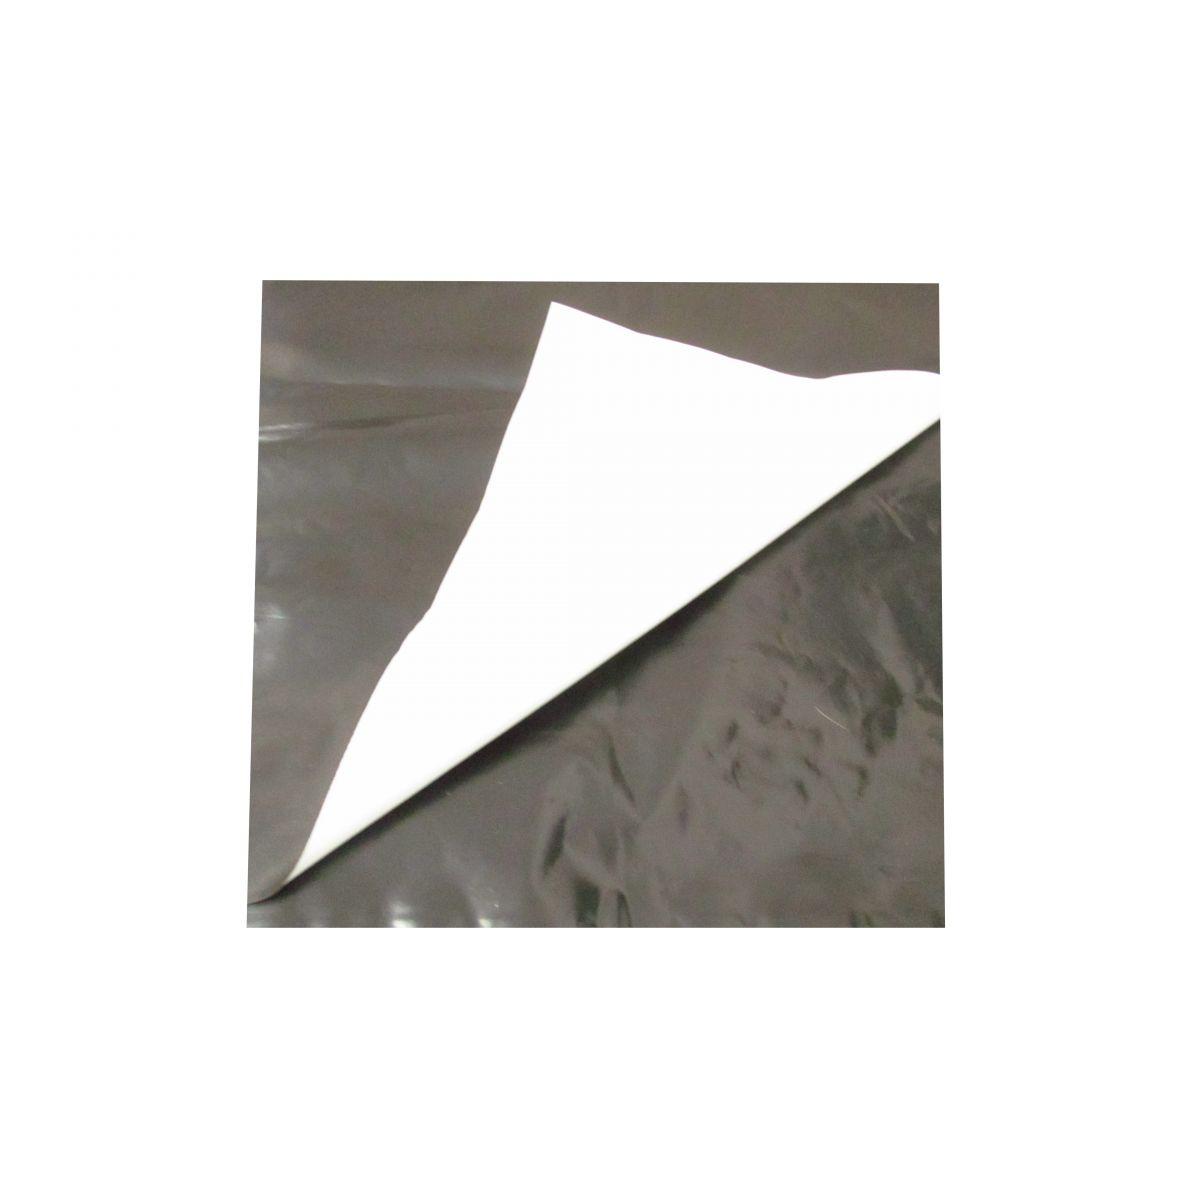 Lona Plastica Preta e Branca 10m x 8m 150 Micras  - Casafaz